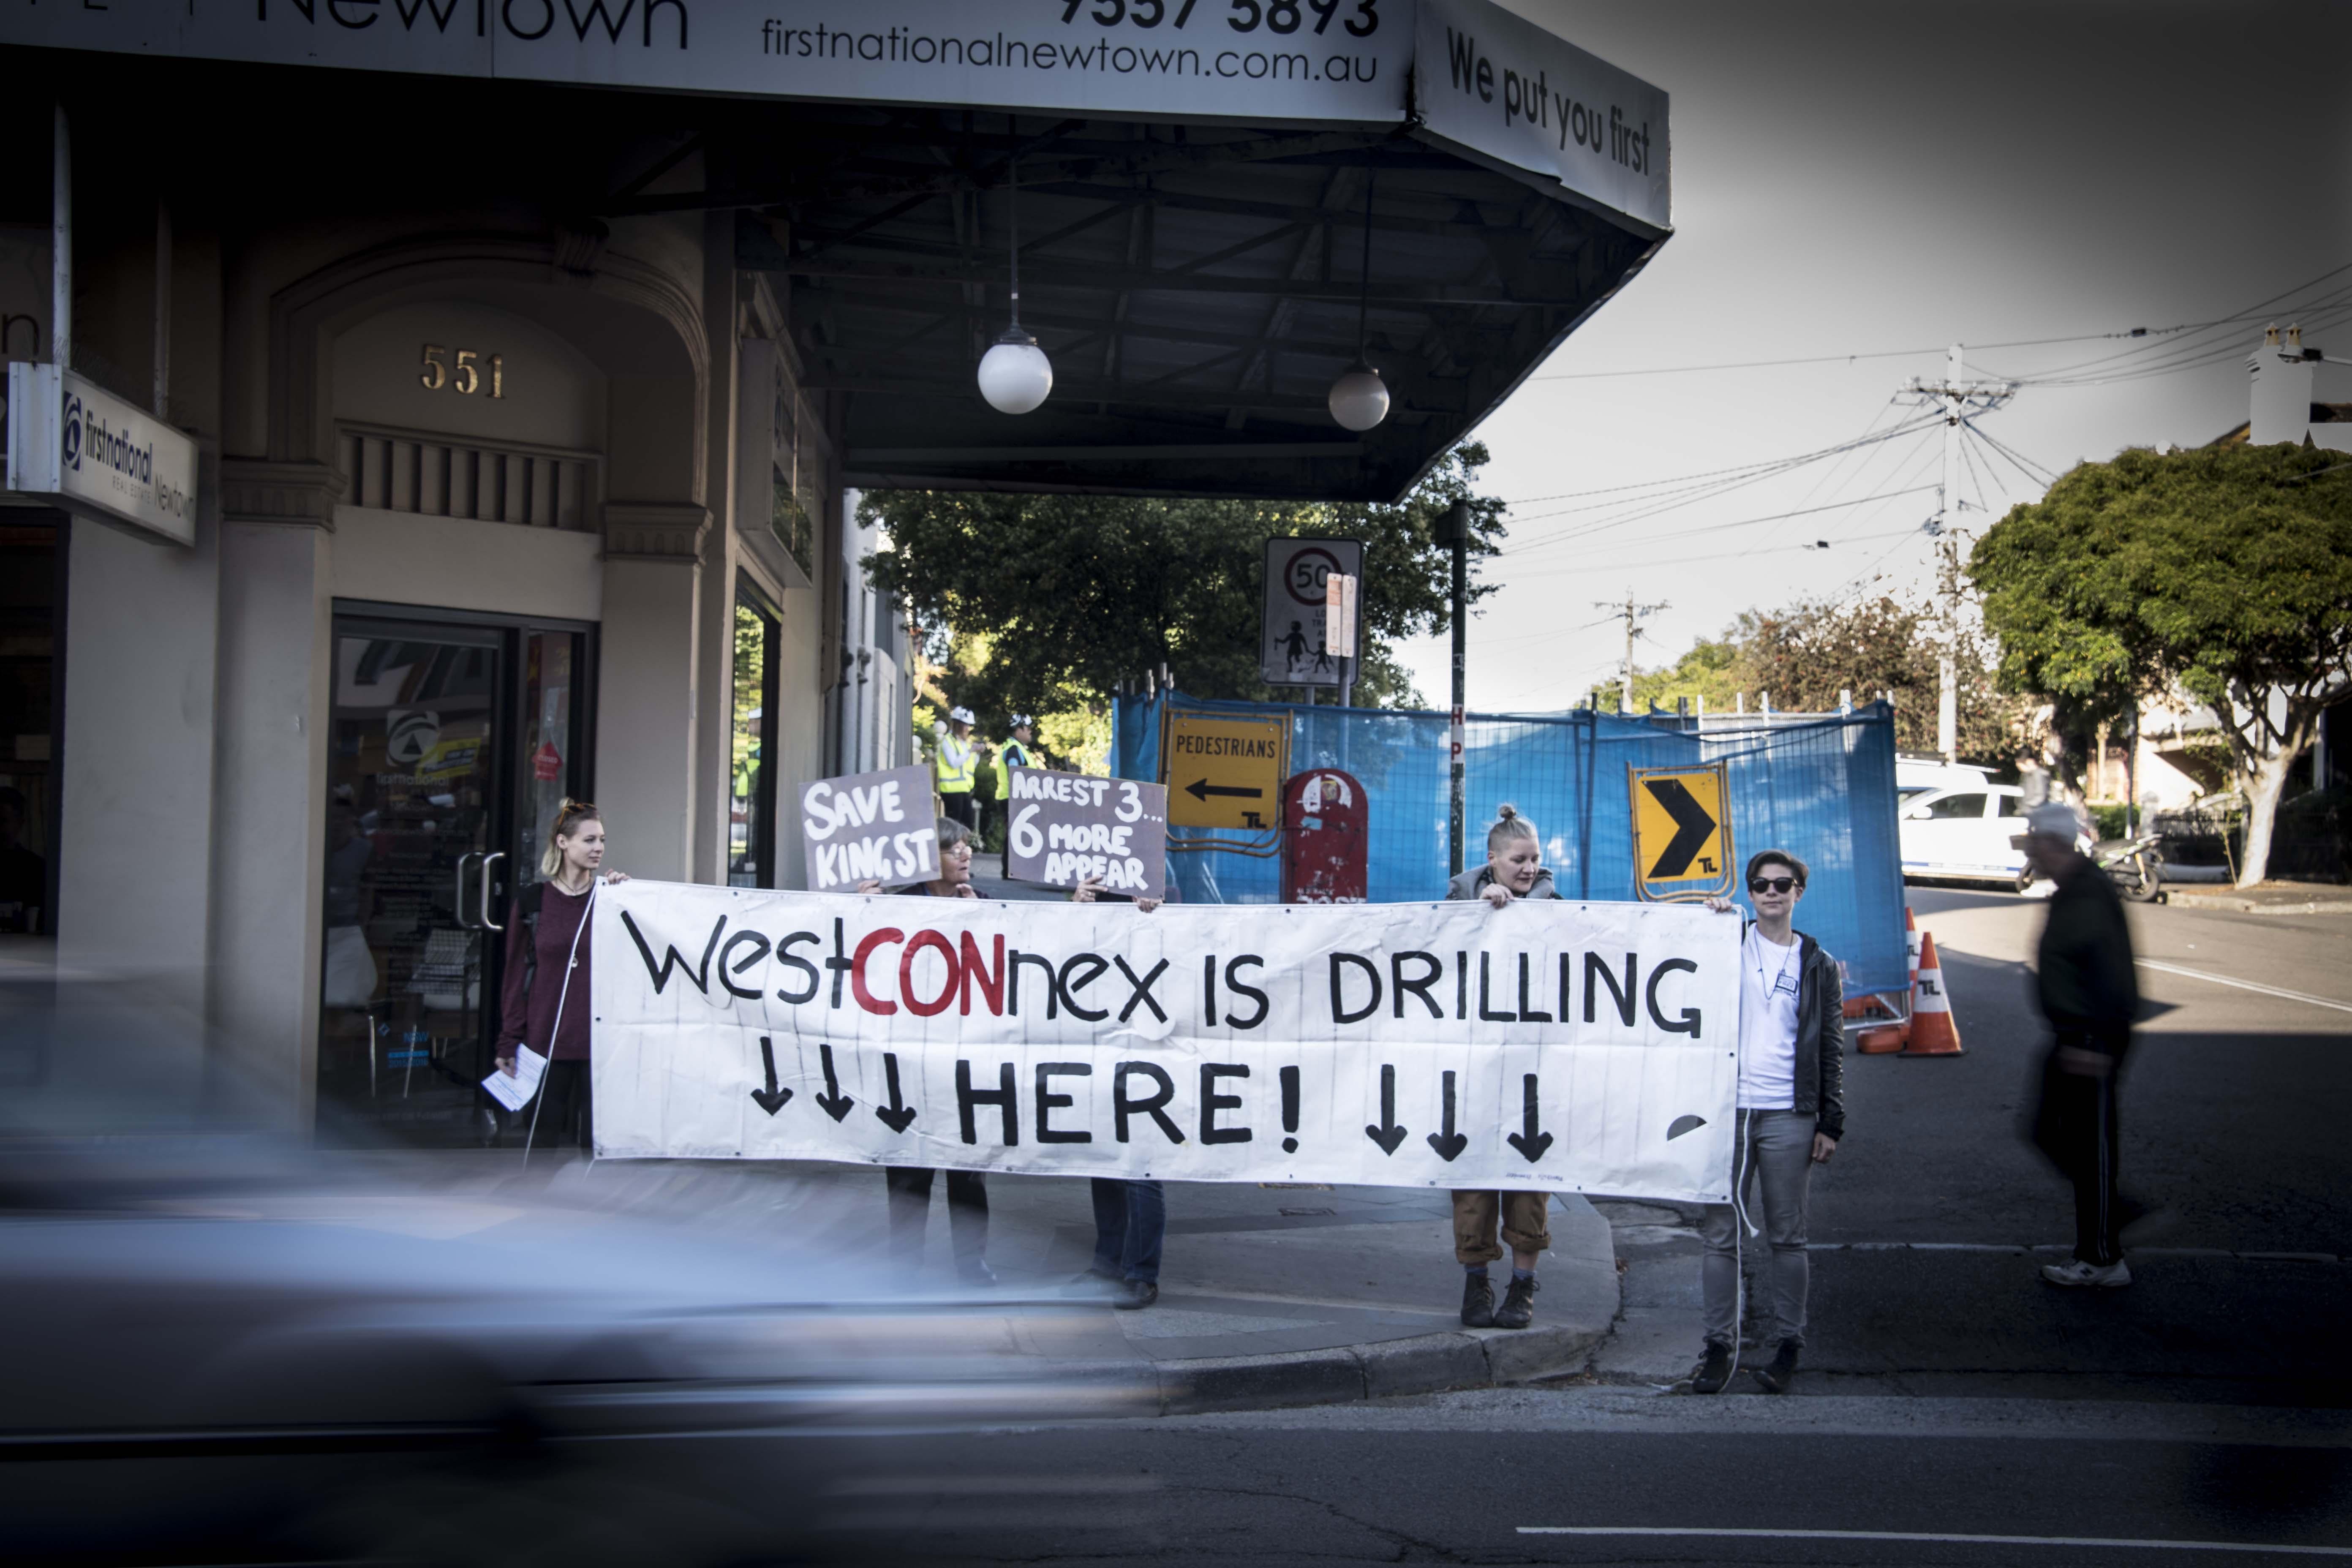 westconnex-drilling_0050